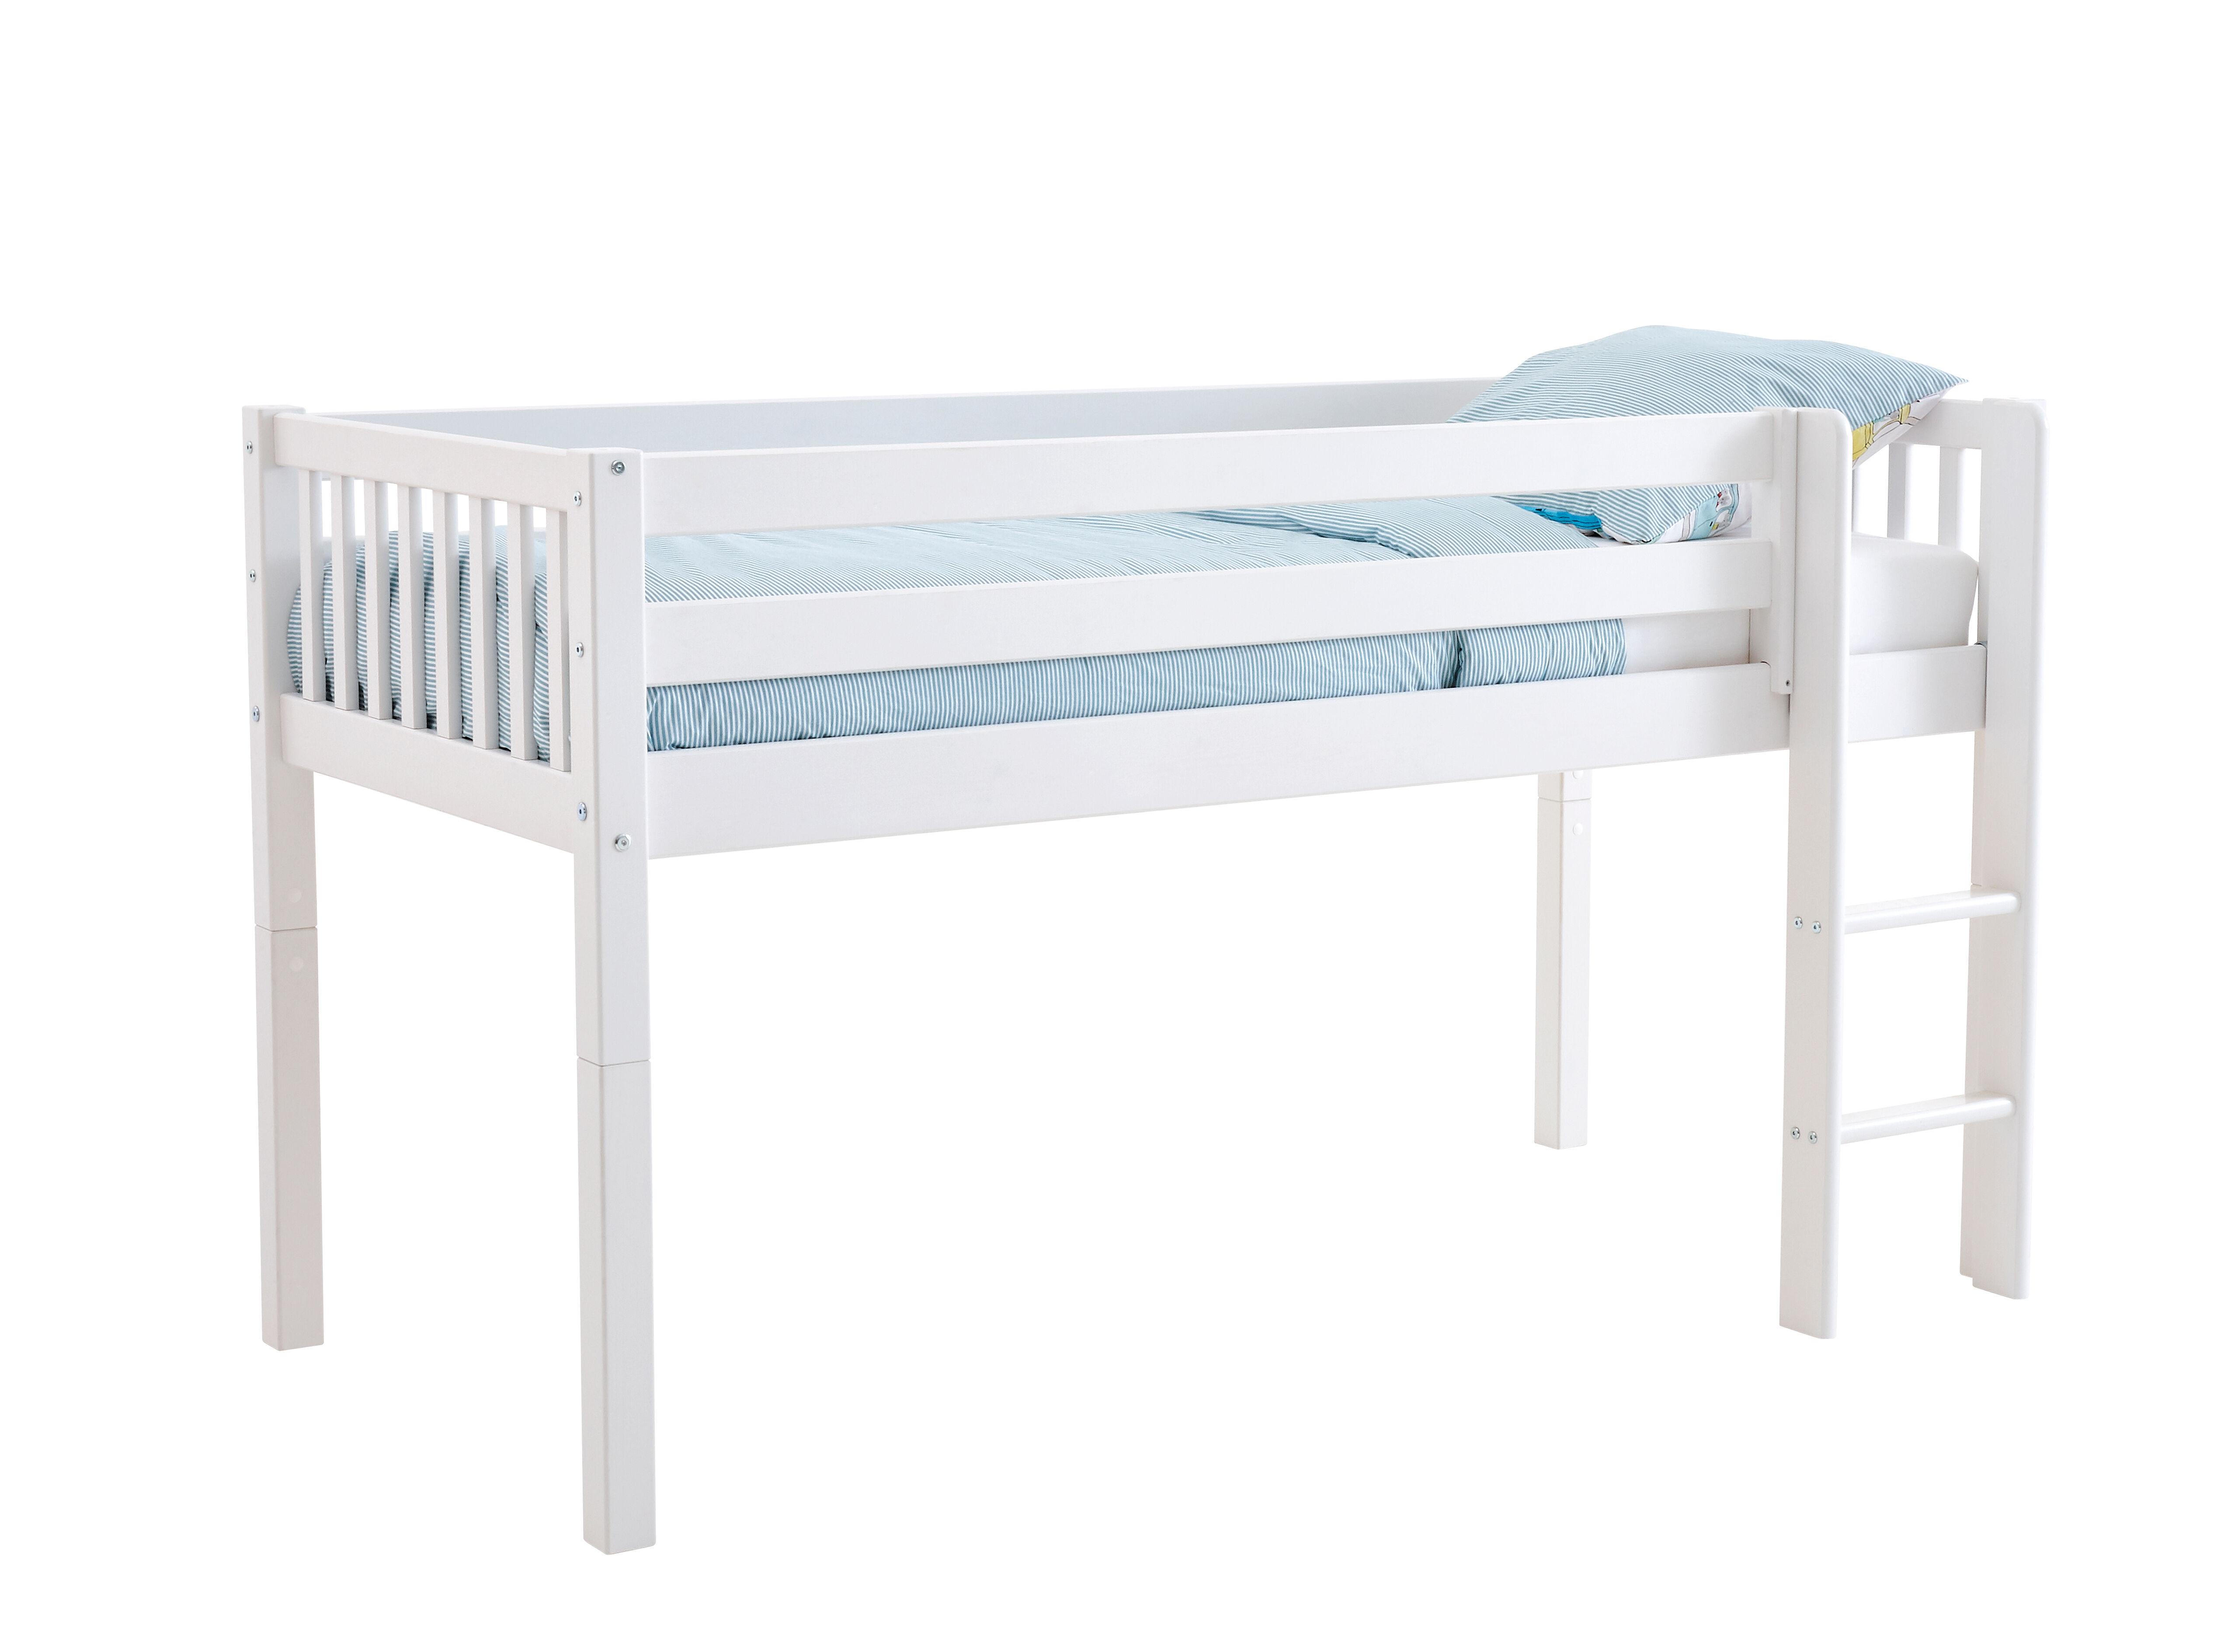 Flexa Basic Nordic halvhøj seng 90x200 cm, med sprosse, hvid.